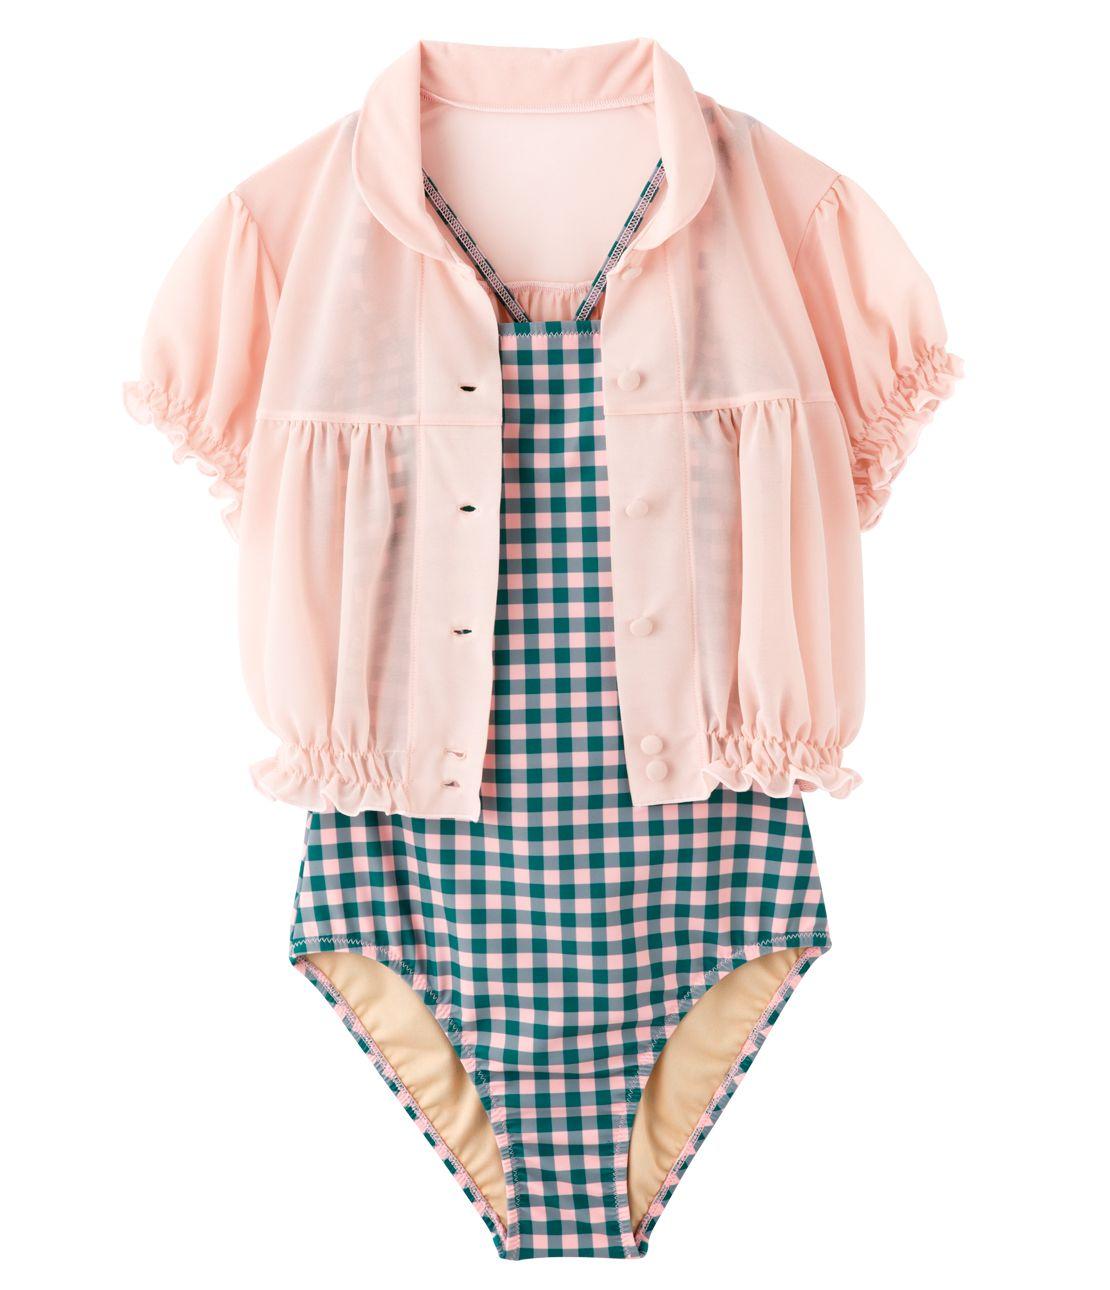 YM格子娃娃泳裝套裝